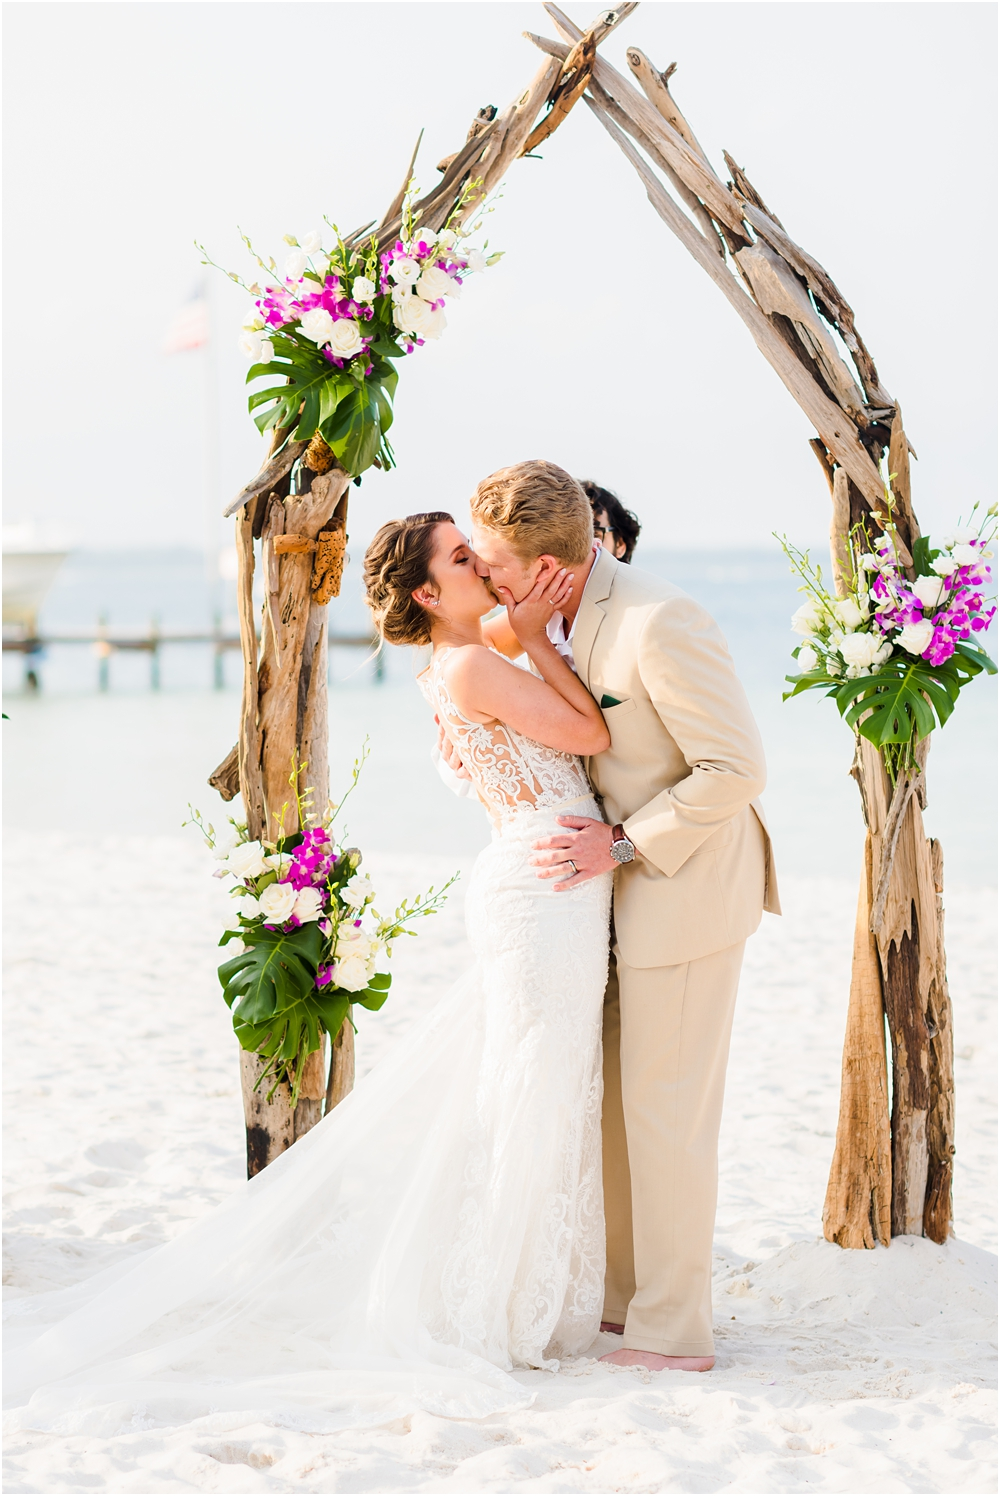 hemingways-pensacola-beach-wedding-kiersten-stevenson-photography-47.jpg